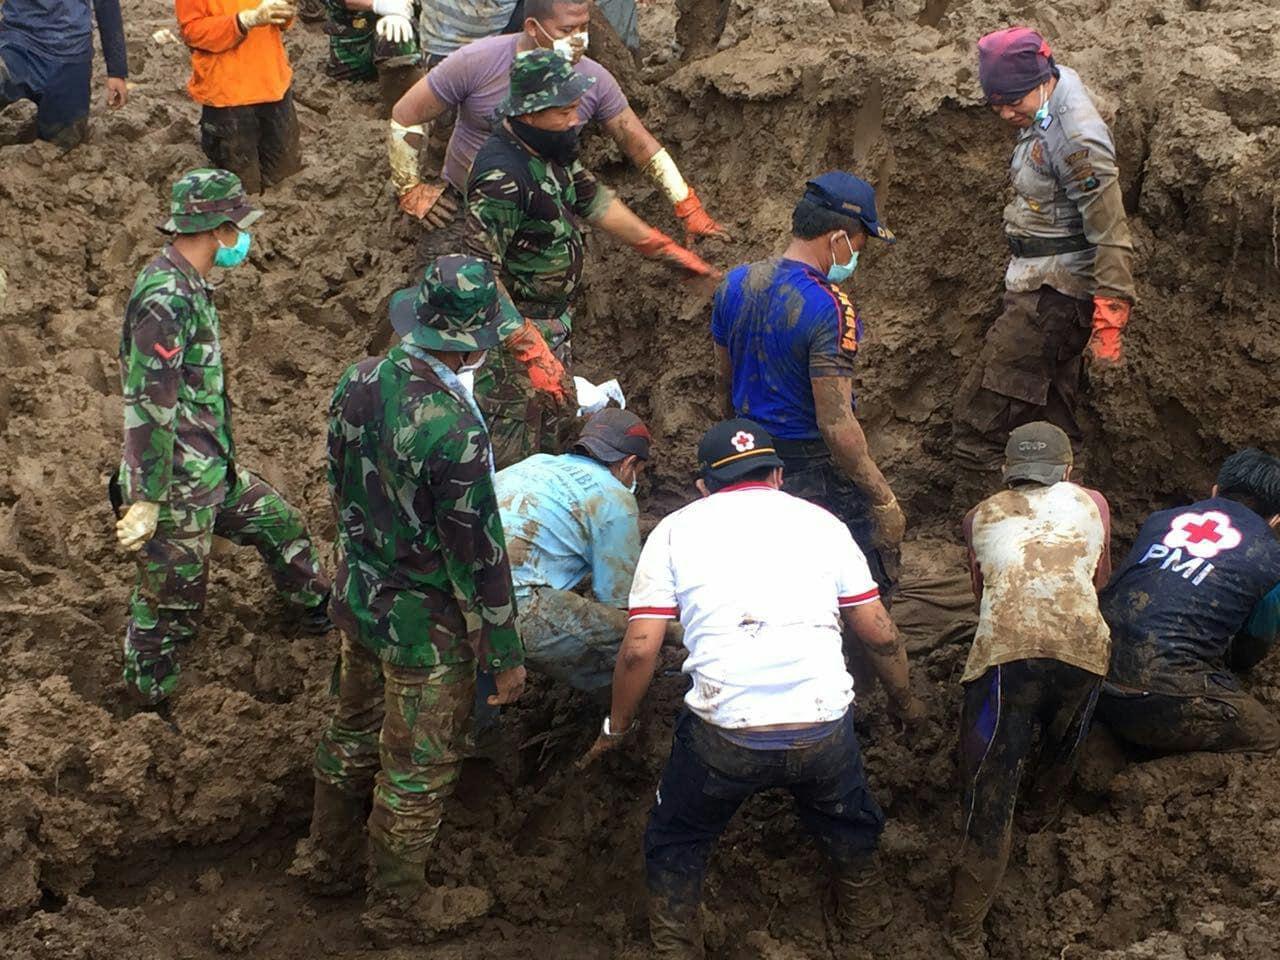 TNI Bantu Evakuasi Korban Tanah Longsor Jember